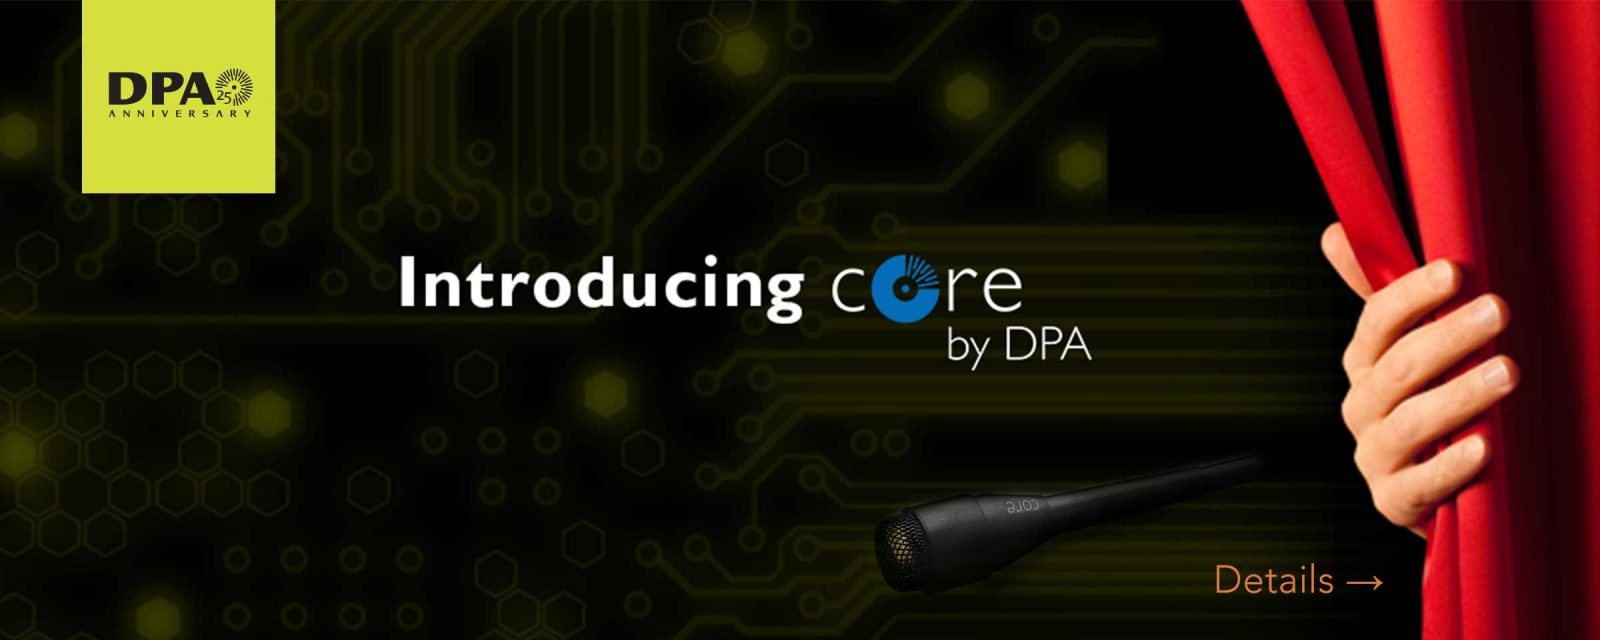 Introducing DPA CORE Technology